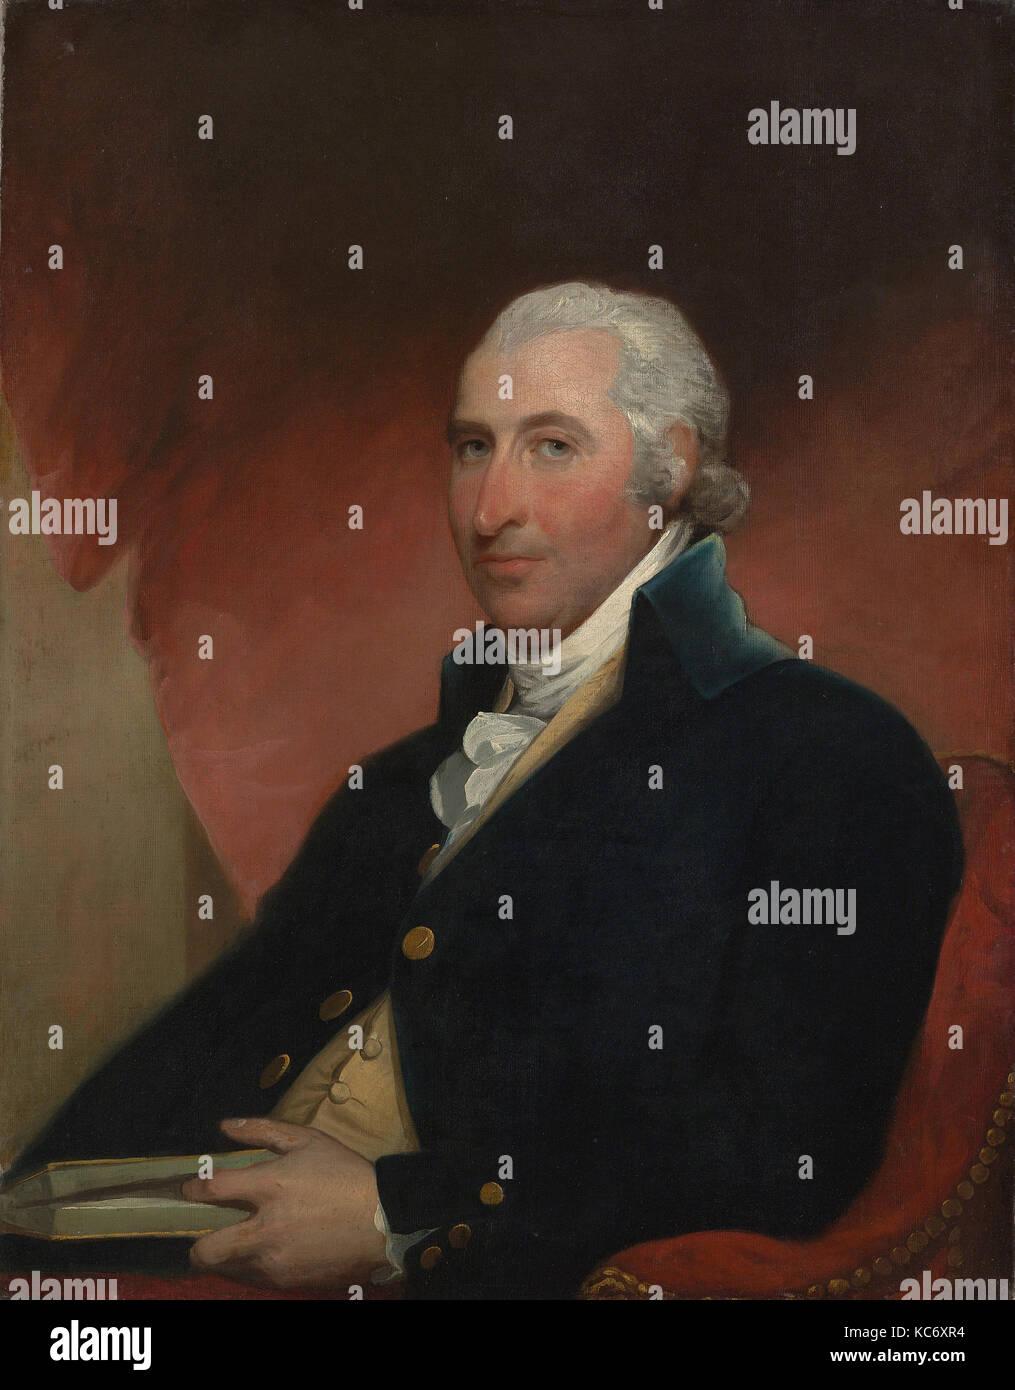 John Shaw, 1793, realizzato in Stati Uniti, olio su tela, 36 x 28. (91,4 x 71,1 cm), dipinti, Gilbert Stuart (American, Immagini Stock